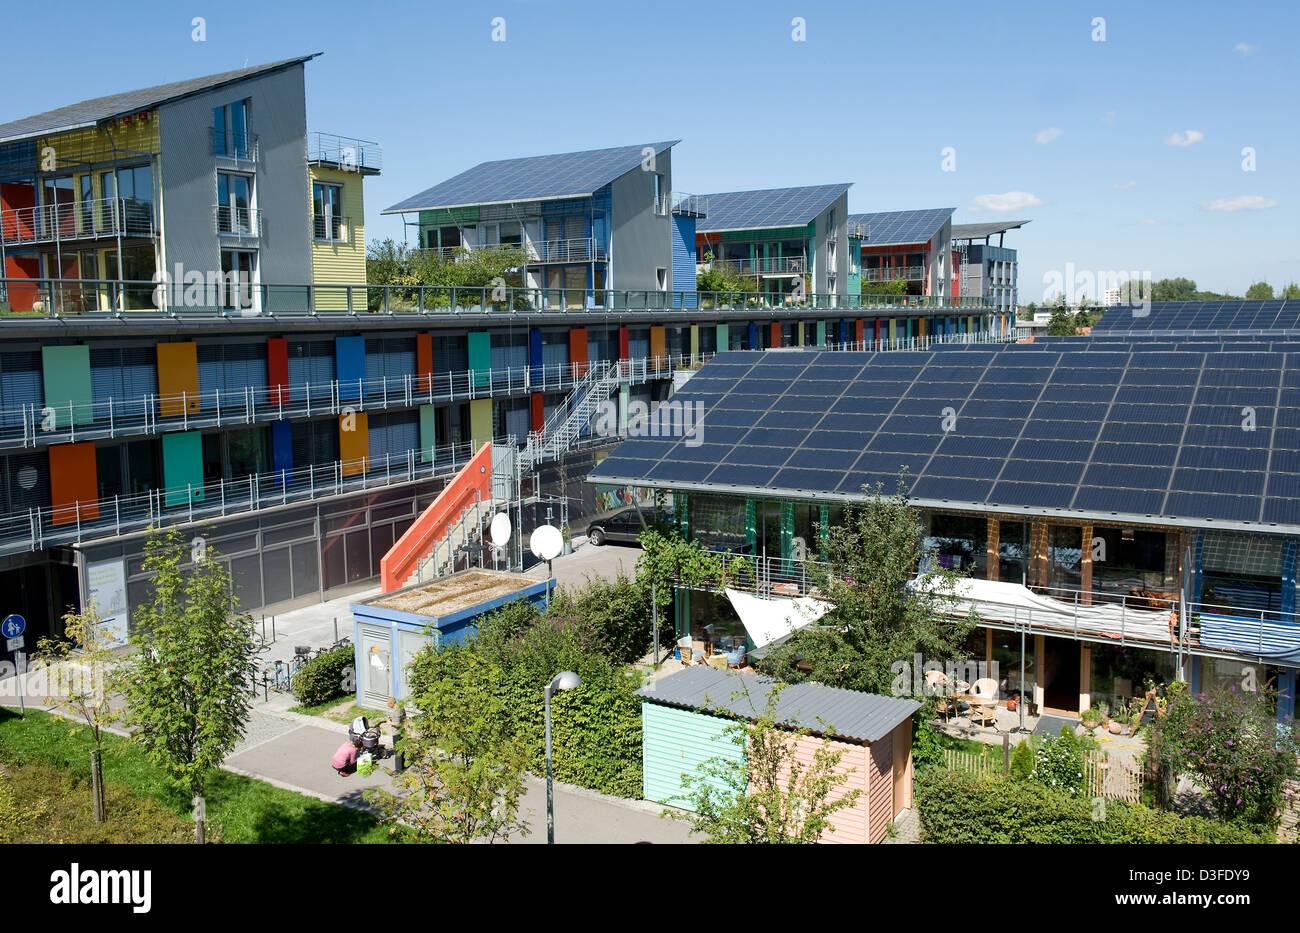 Freiburg, Germany, Solar Community in the Vauban quarter ...